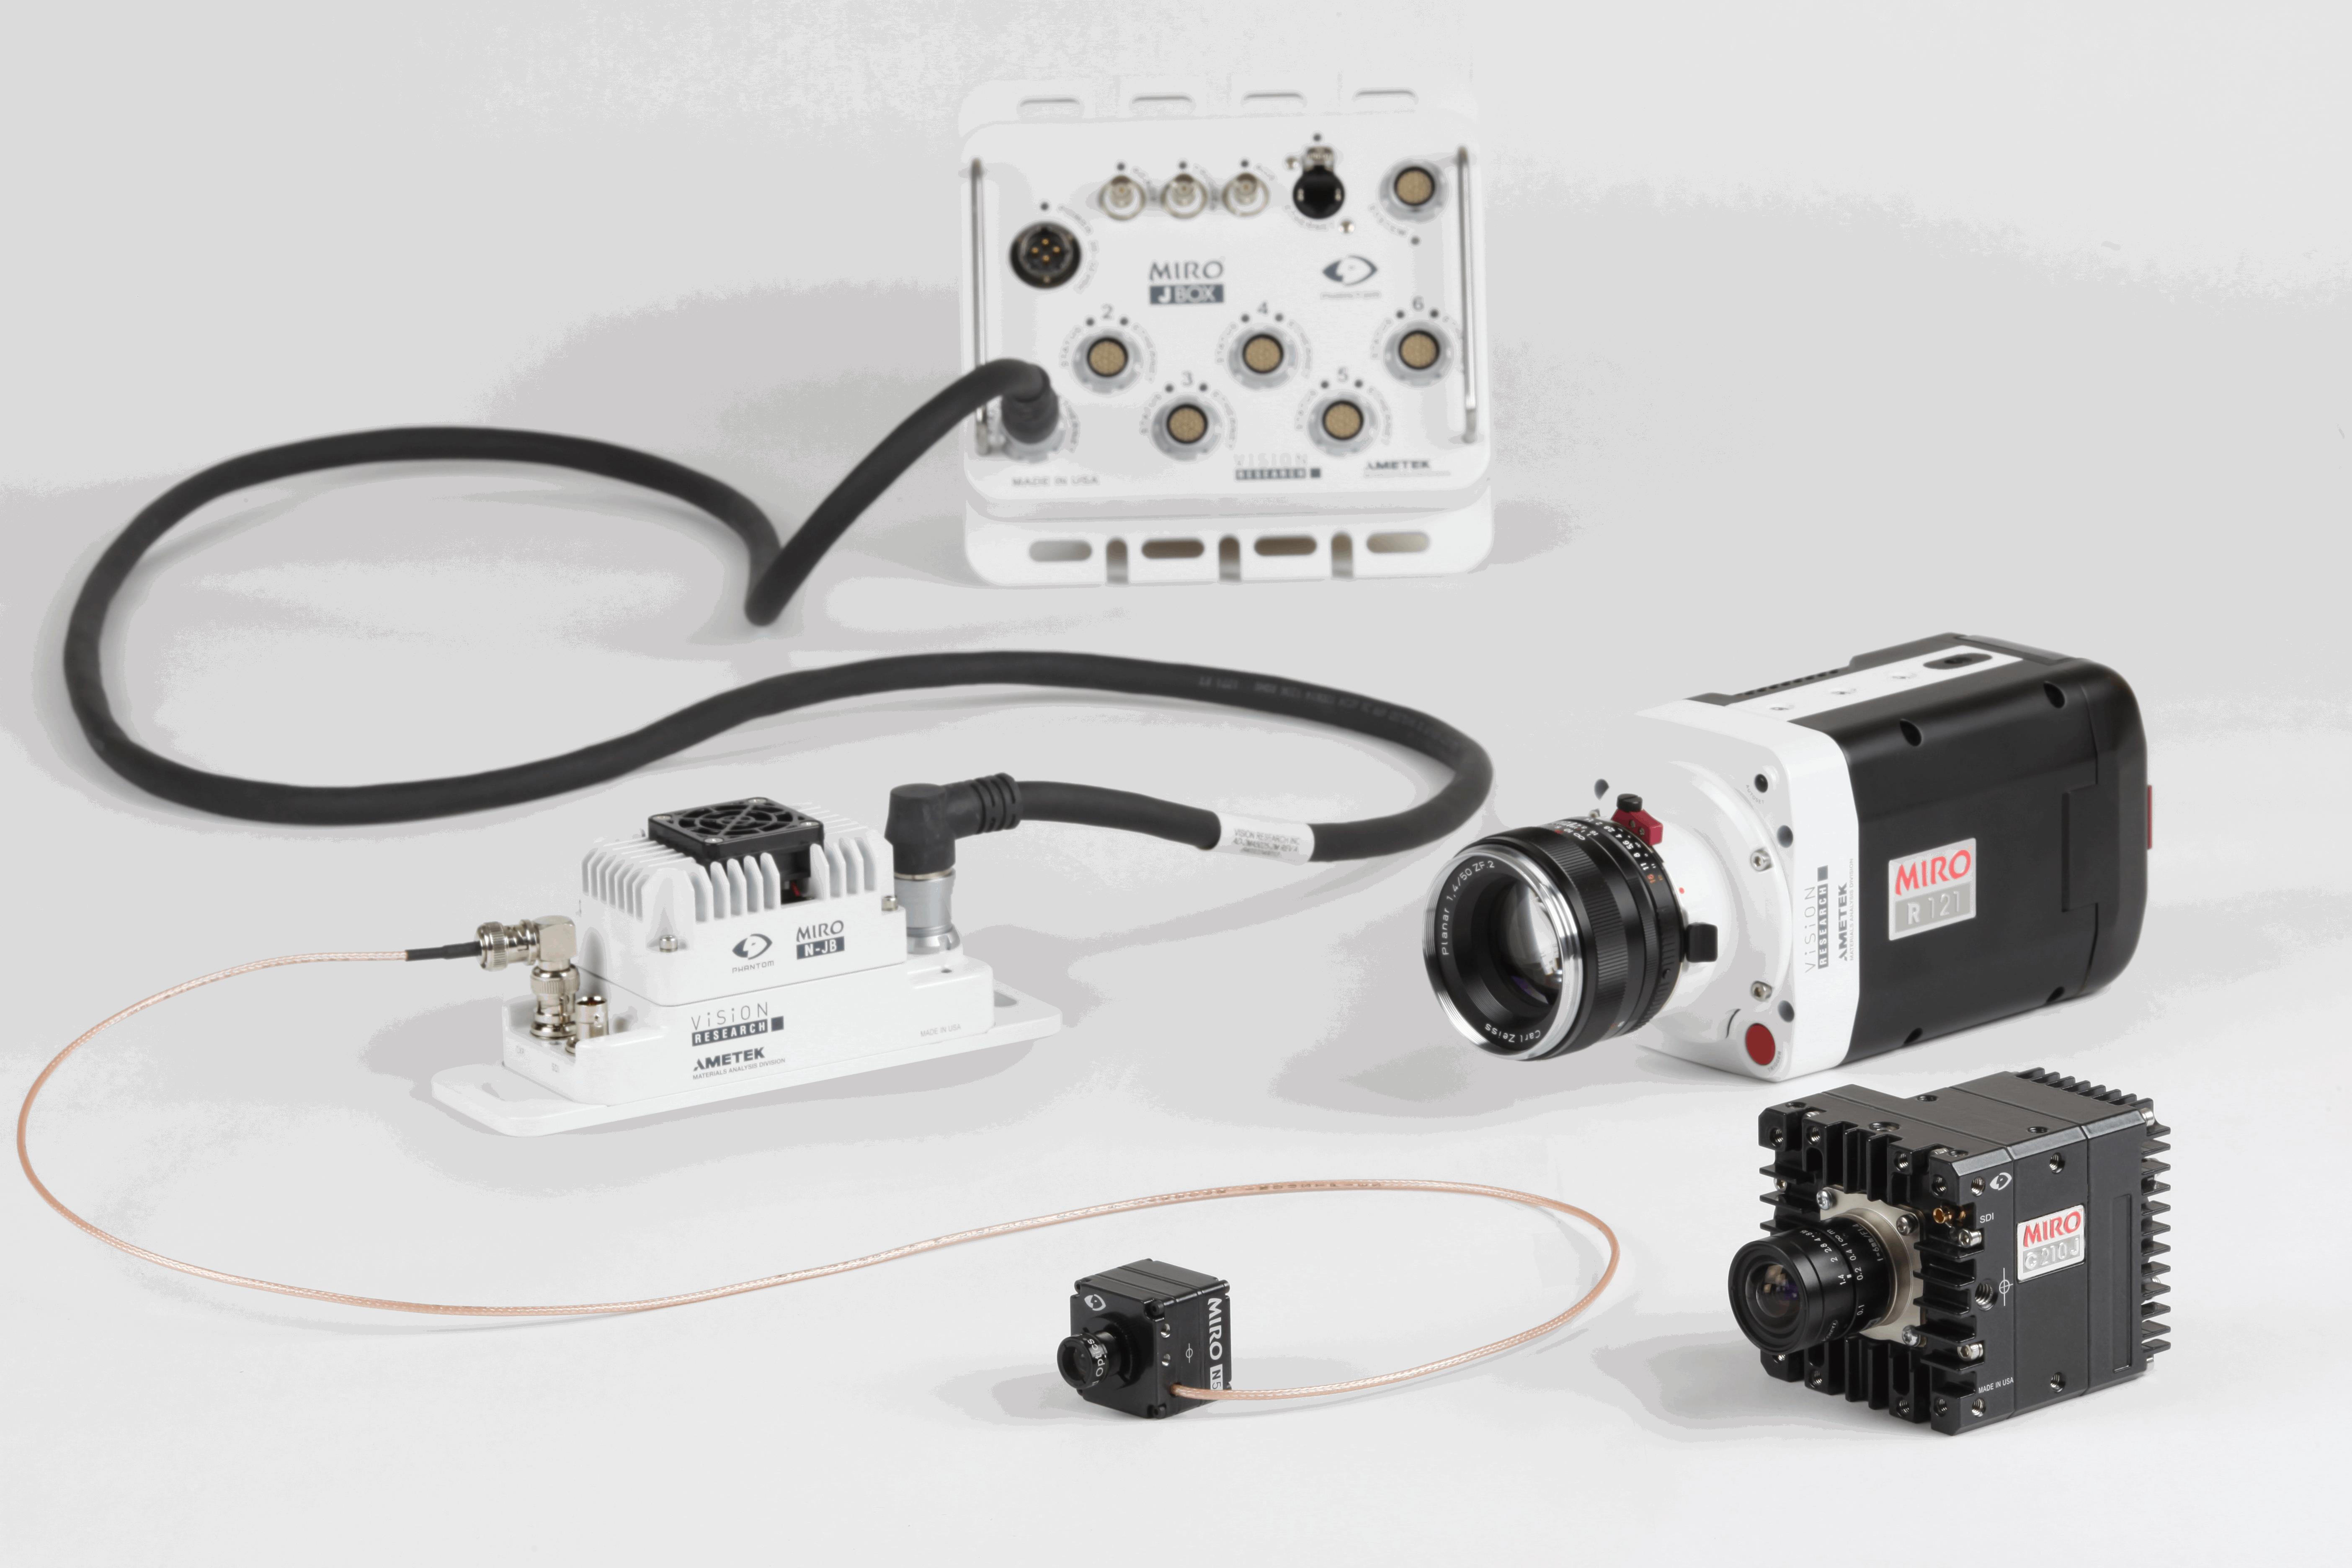 vision research debuts phantom miro n series at automotive testing expo usa